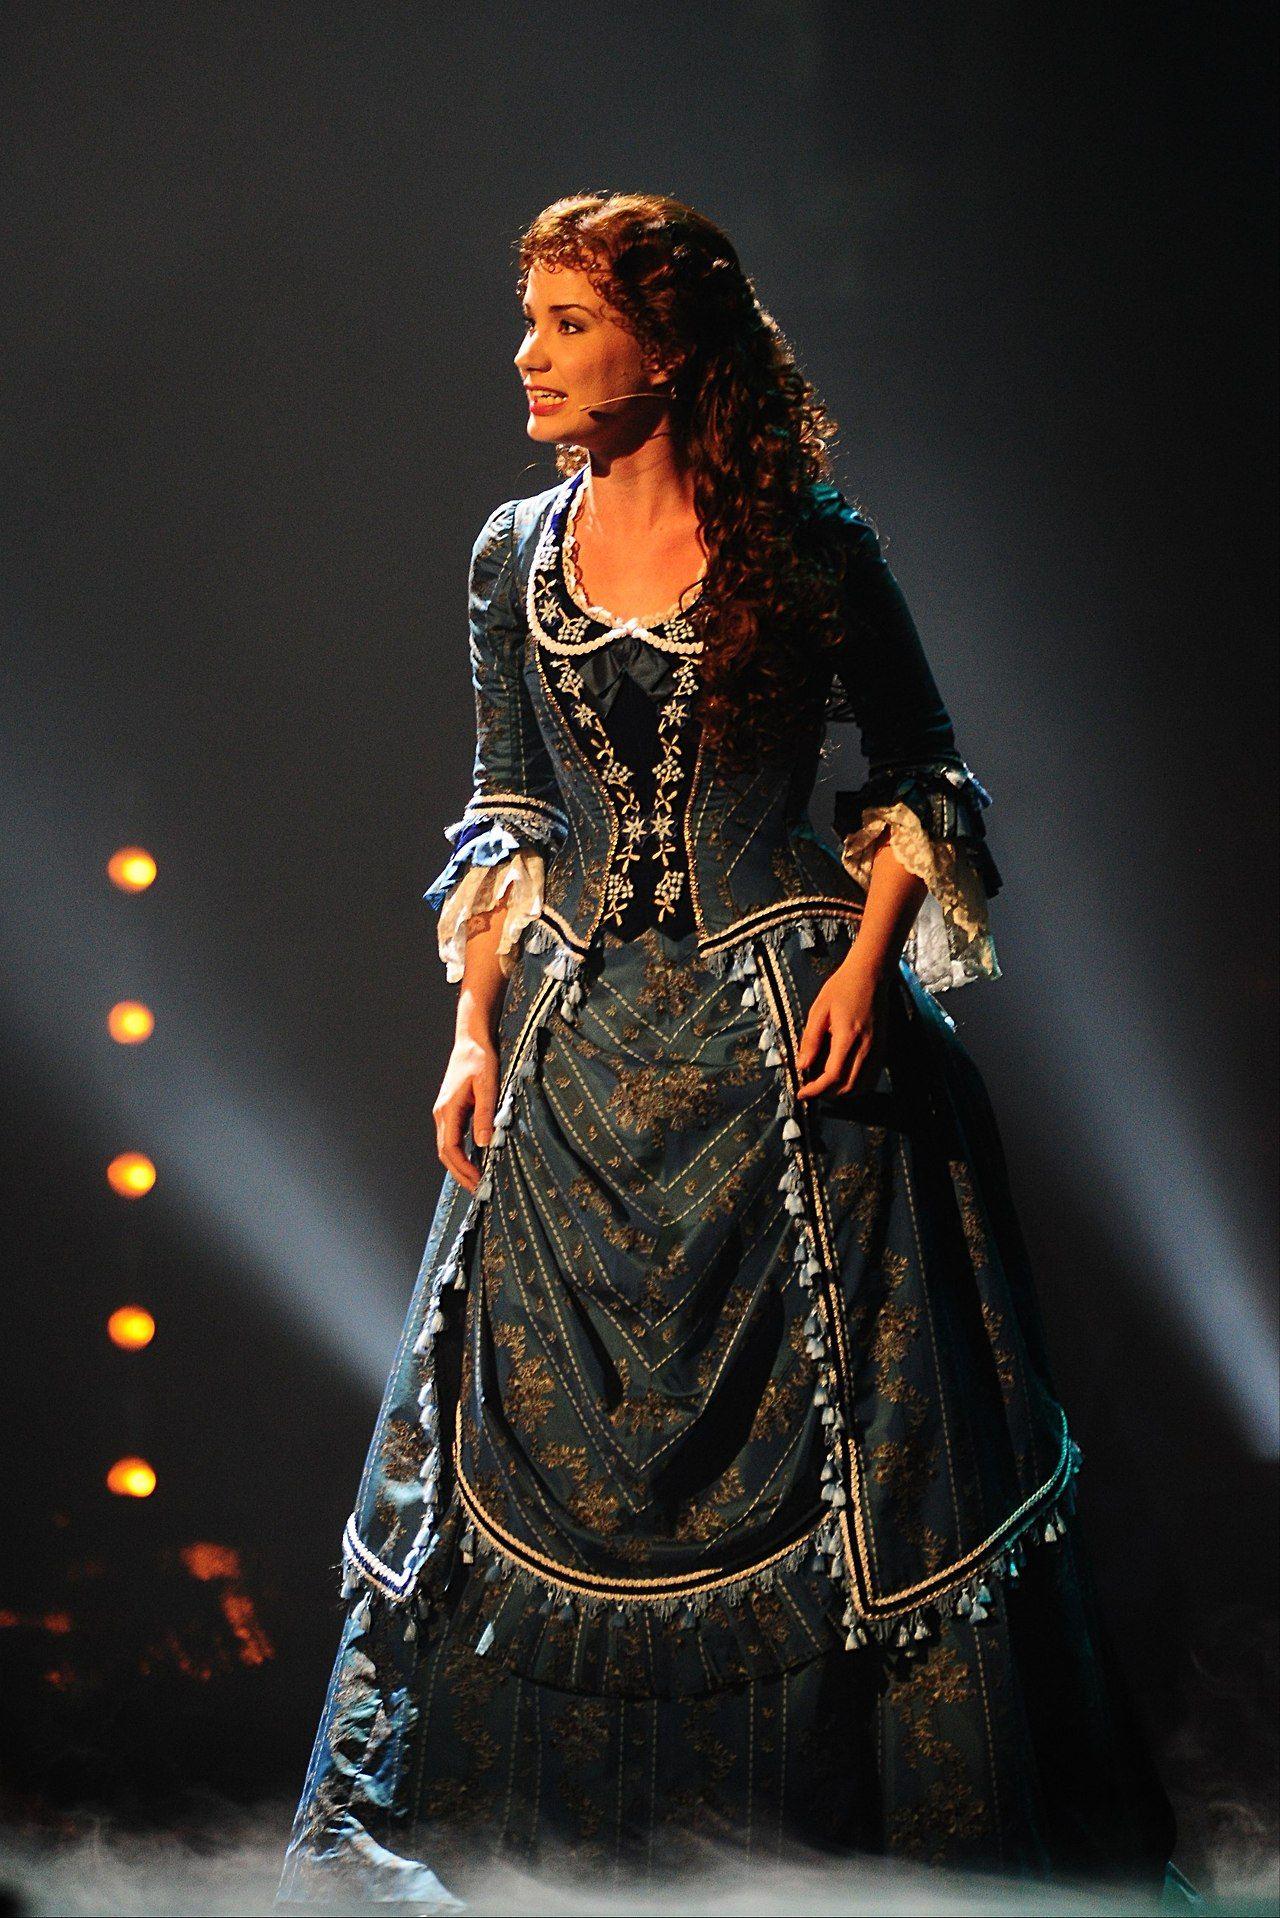 sierra boggess phantom of the opera wishing you were